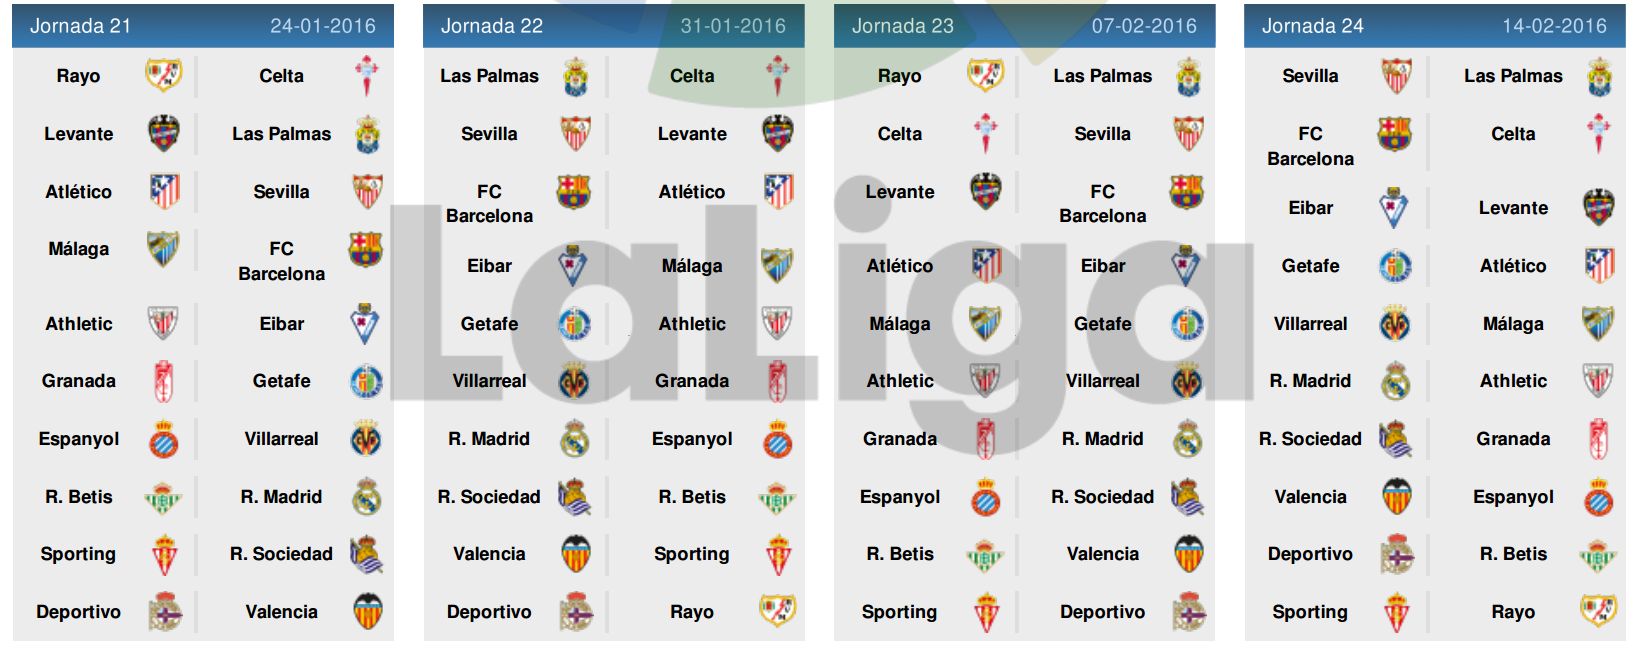 Jadwal Liga Spanyol 2015-2016-6